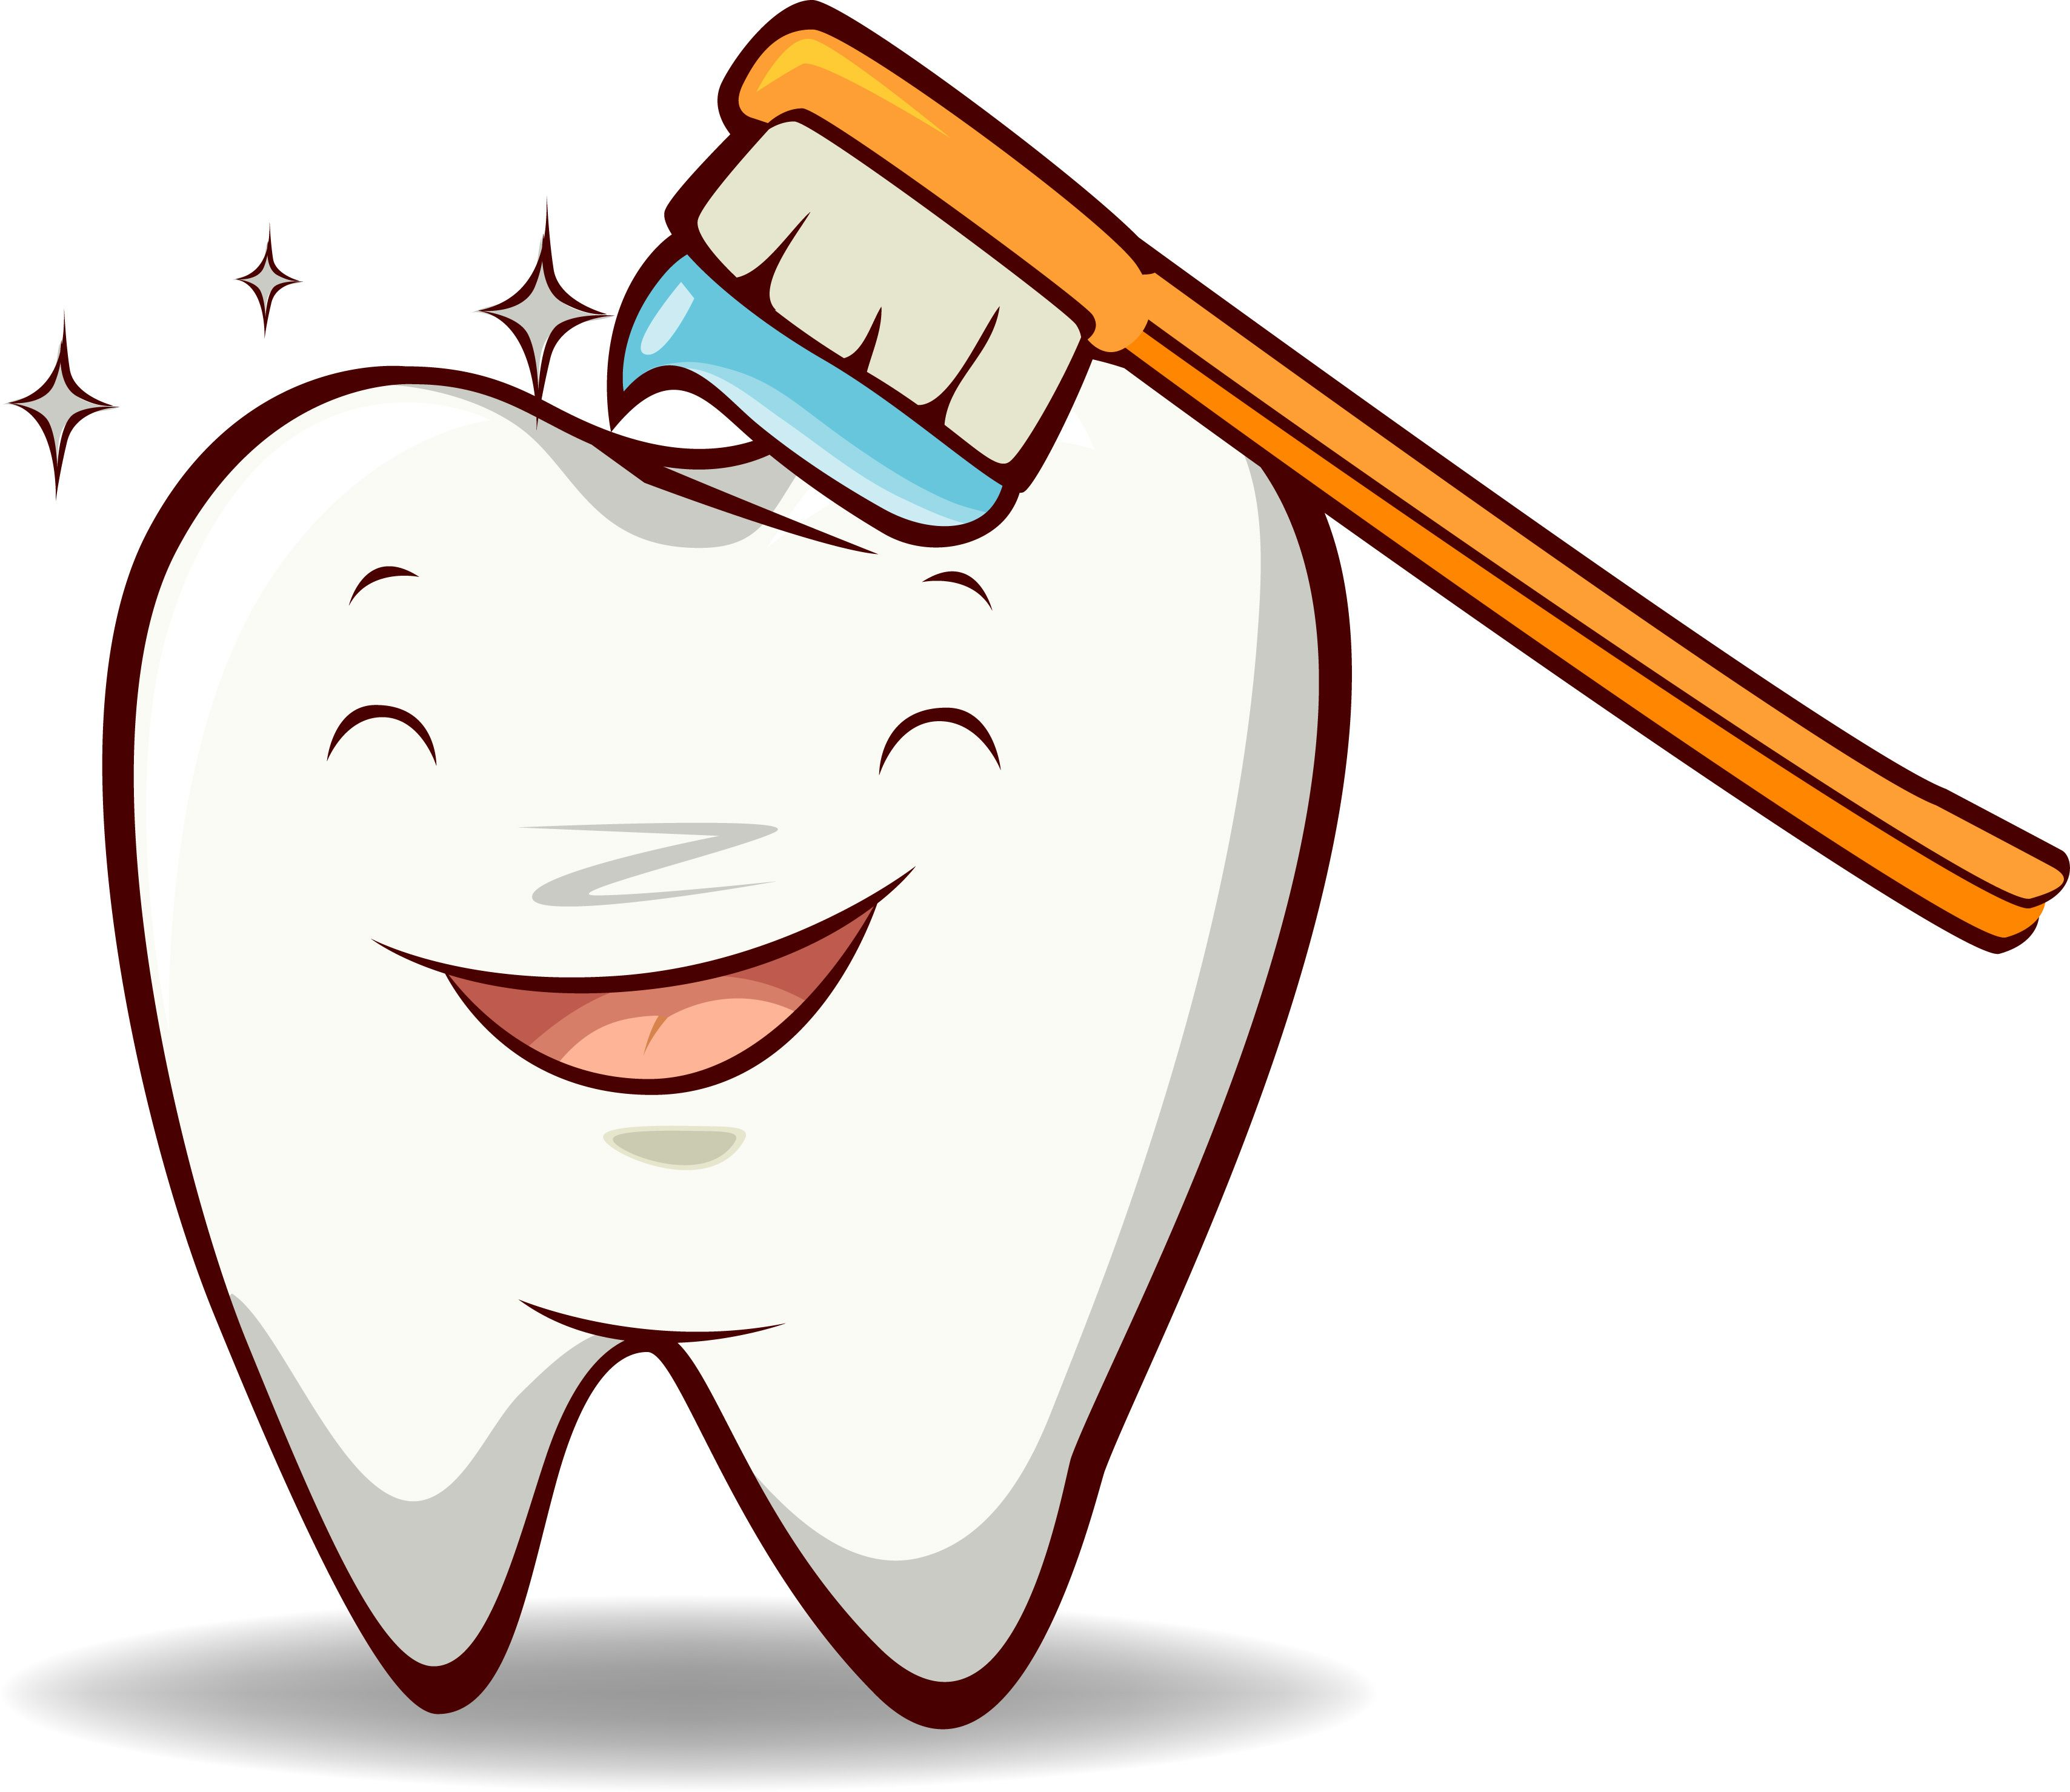 brushing teeth clipart at getdrawings com free for brushing your teeth clipart brushing teeth clip art images